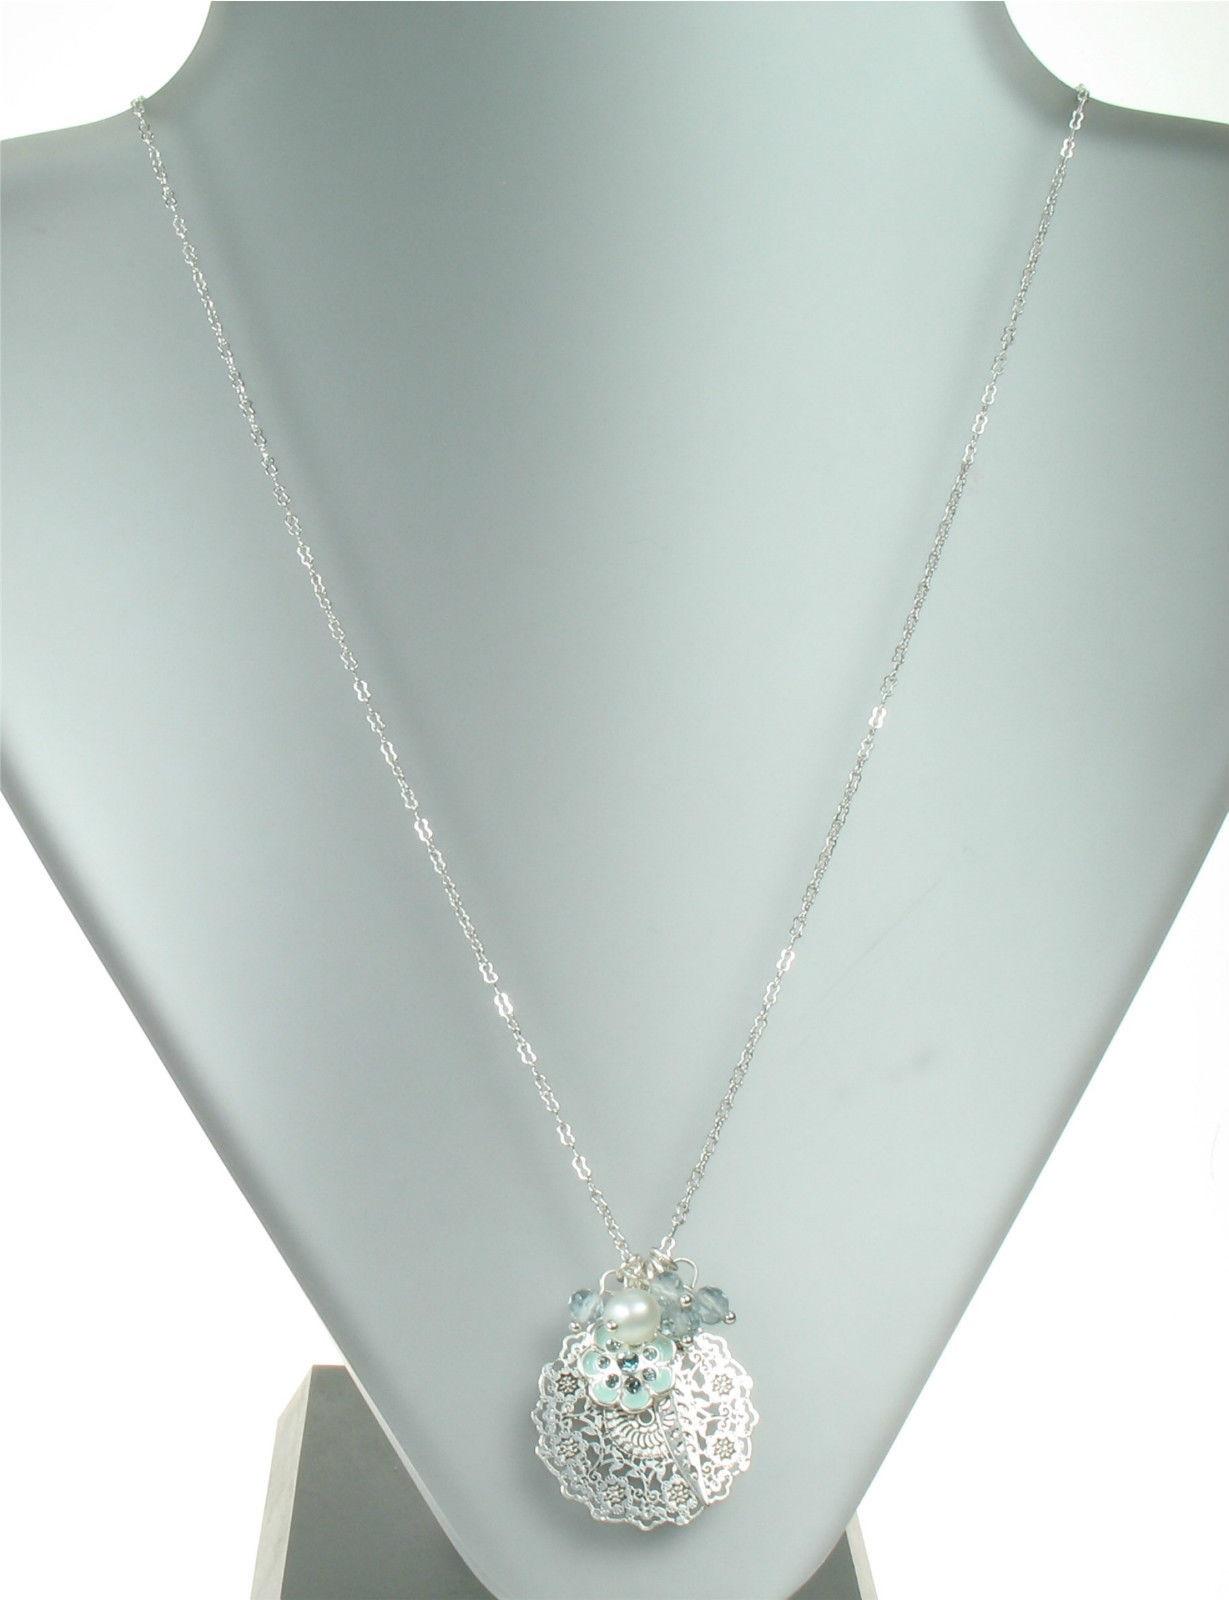 PILGRIM - Bohemian - Flower & Leaf Charm Disc Necklace - Blue/Silver Plate BNWT